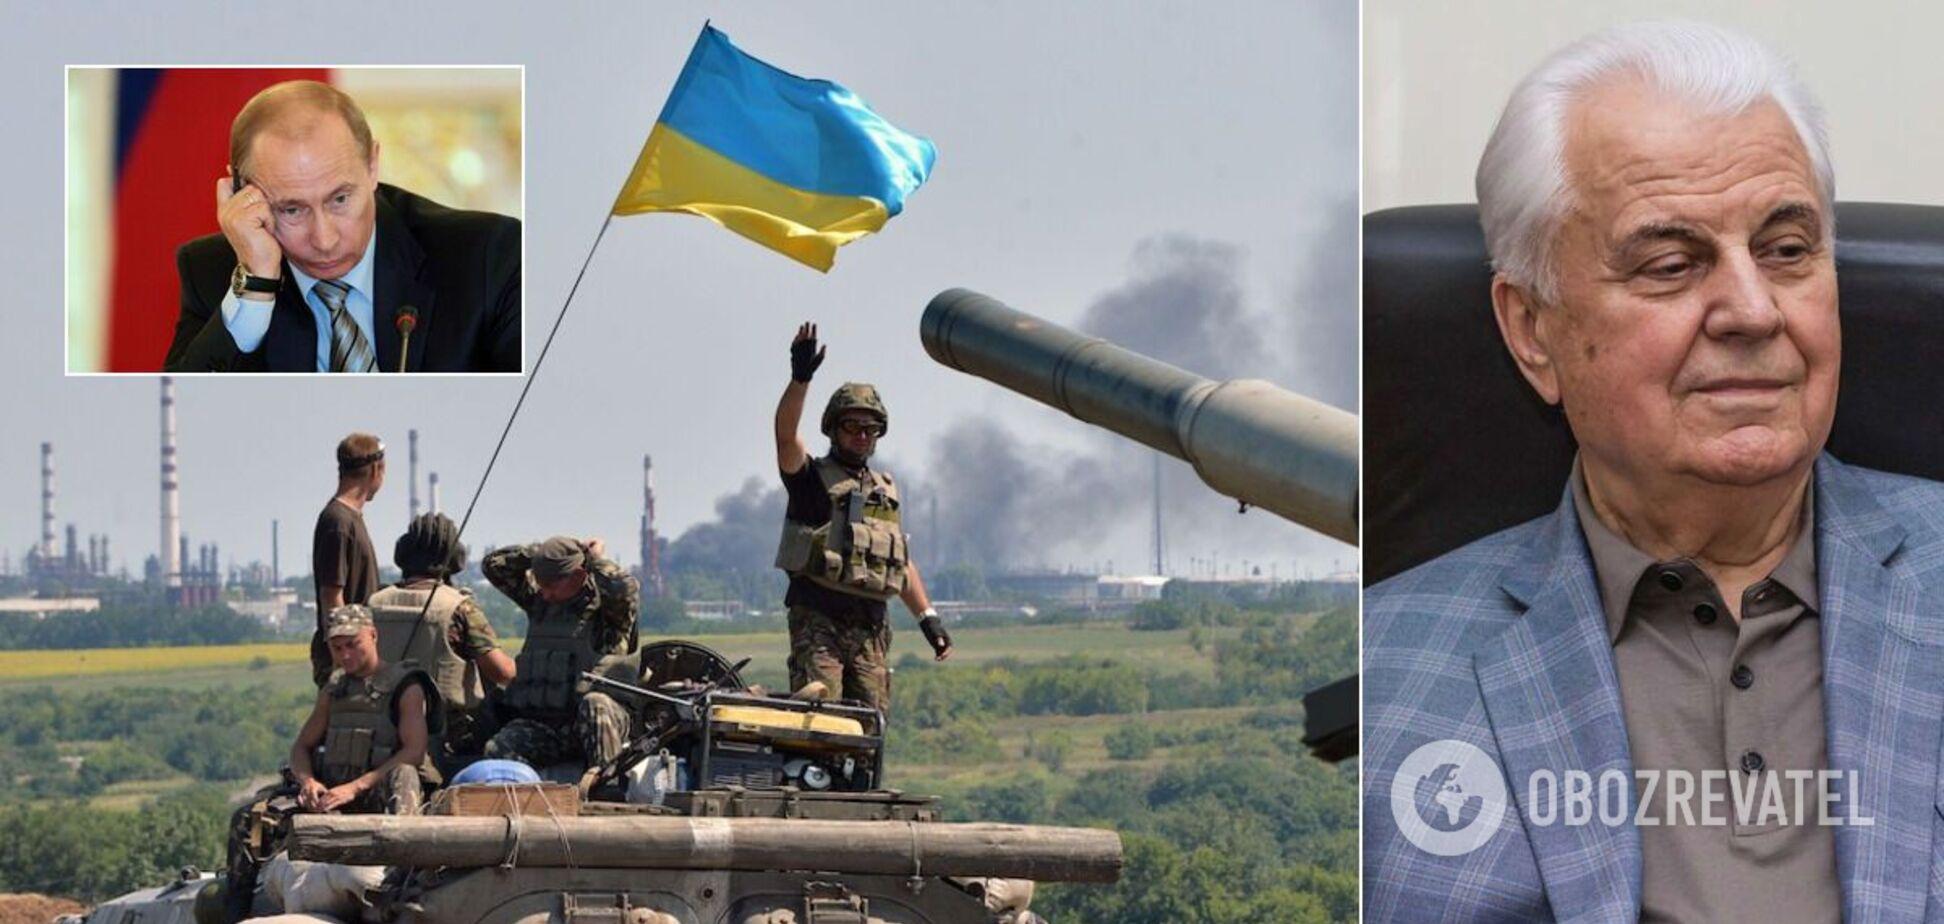 Кравчук заявил о желании Путина закончить войну на Донбассе